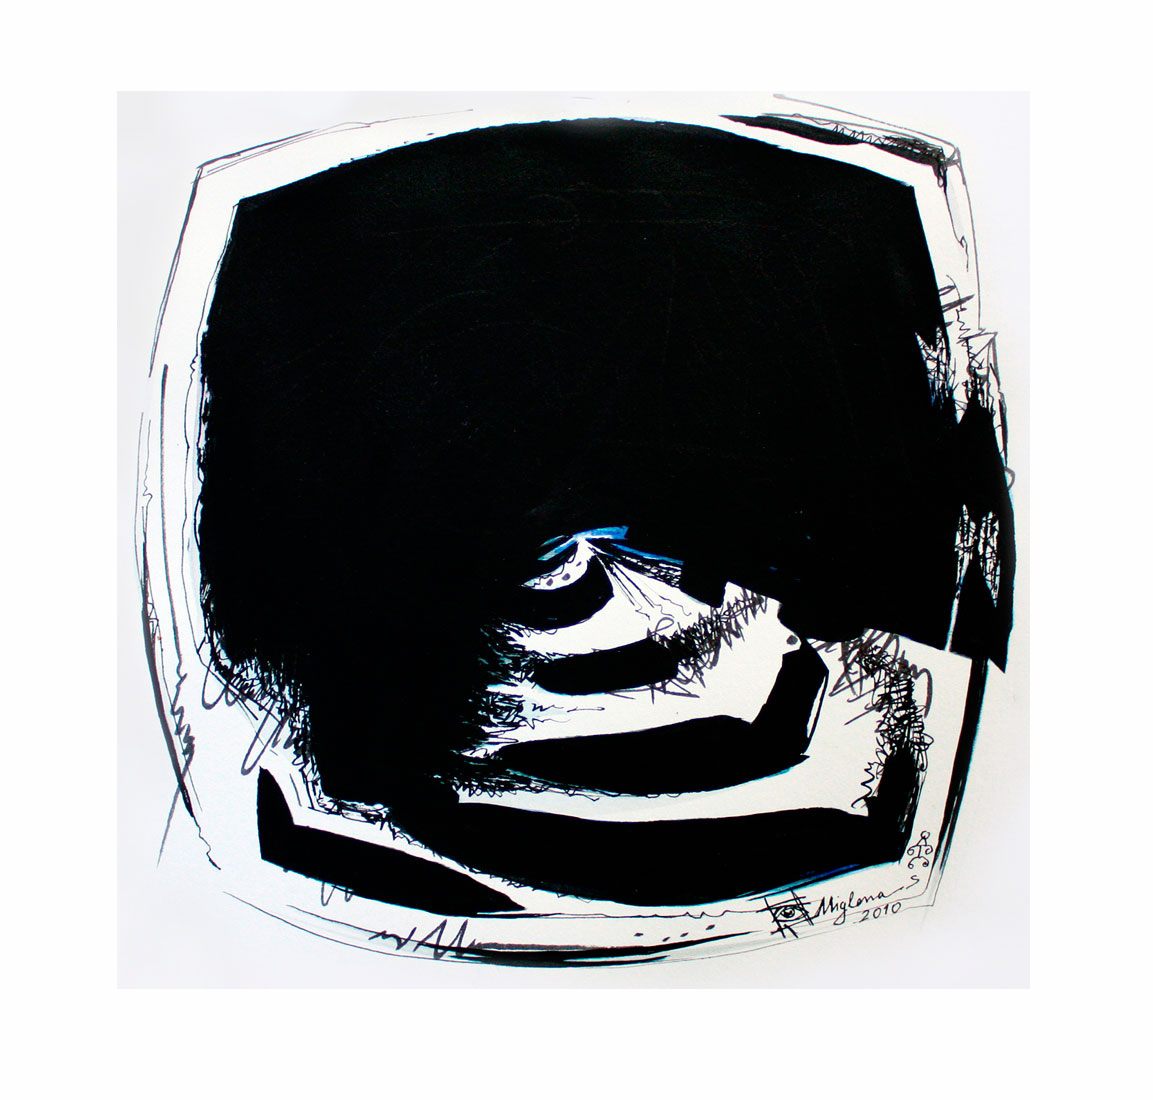 introspection IV, 2010, 20x20 cm.